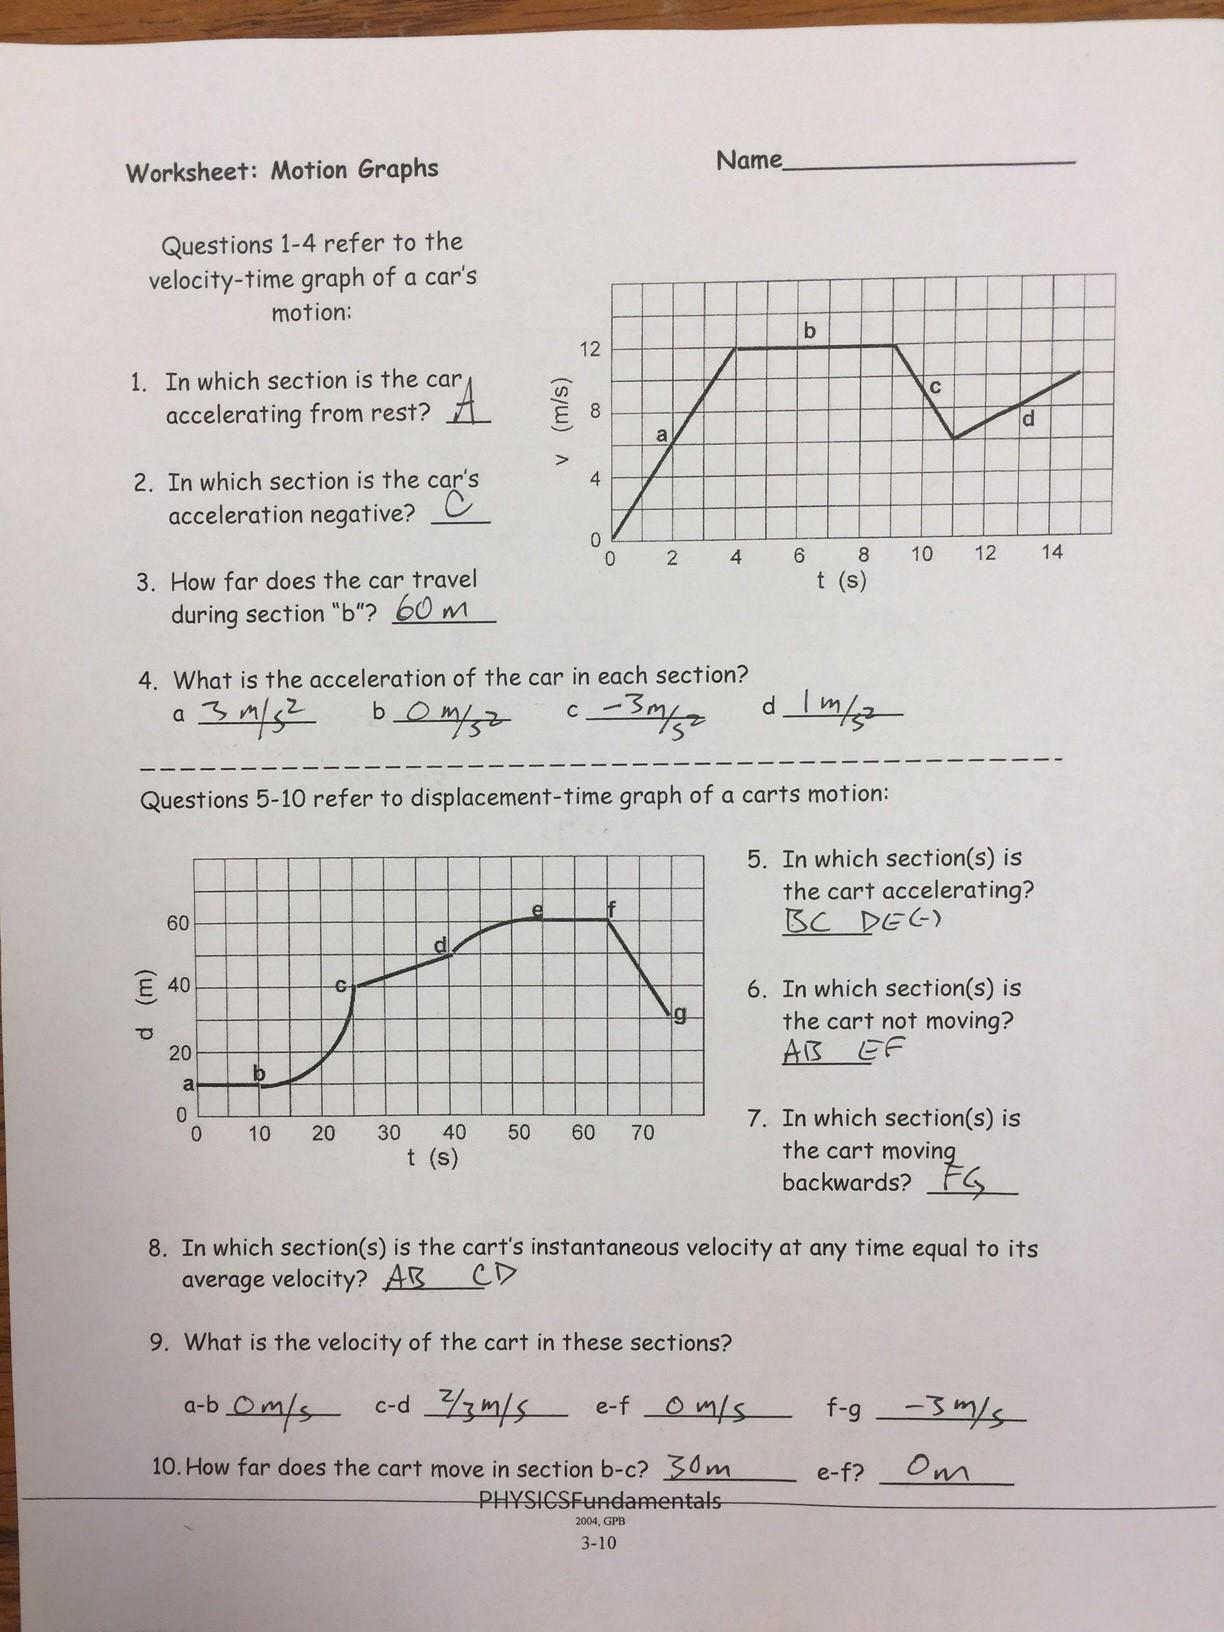 Motion Graphs Worksheet Answer Key Motion Graphs Worksheet